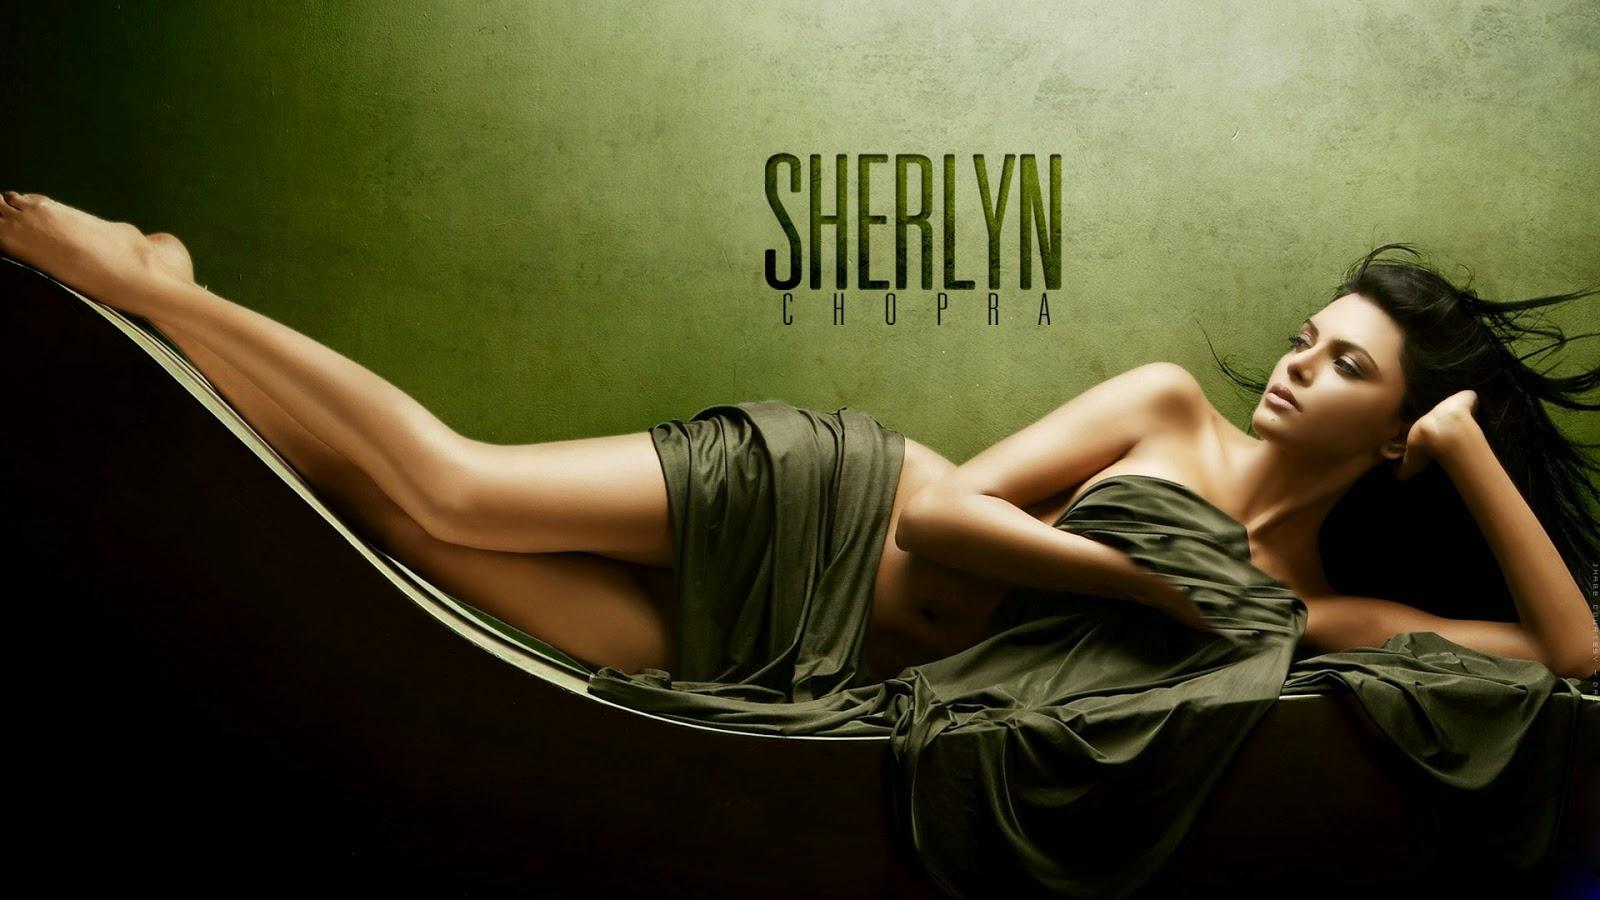 sherlyn chopra Hot Free Wallpaper Download